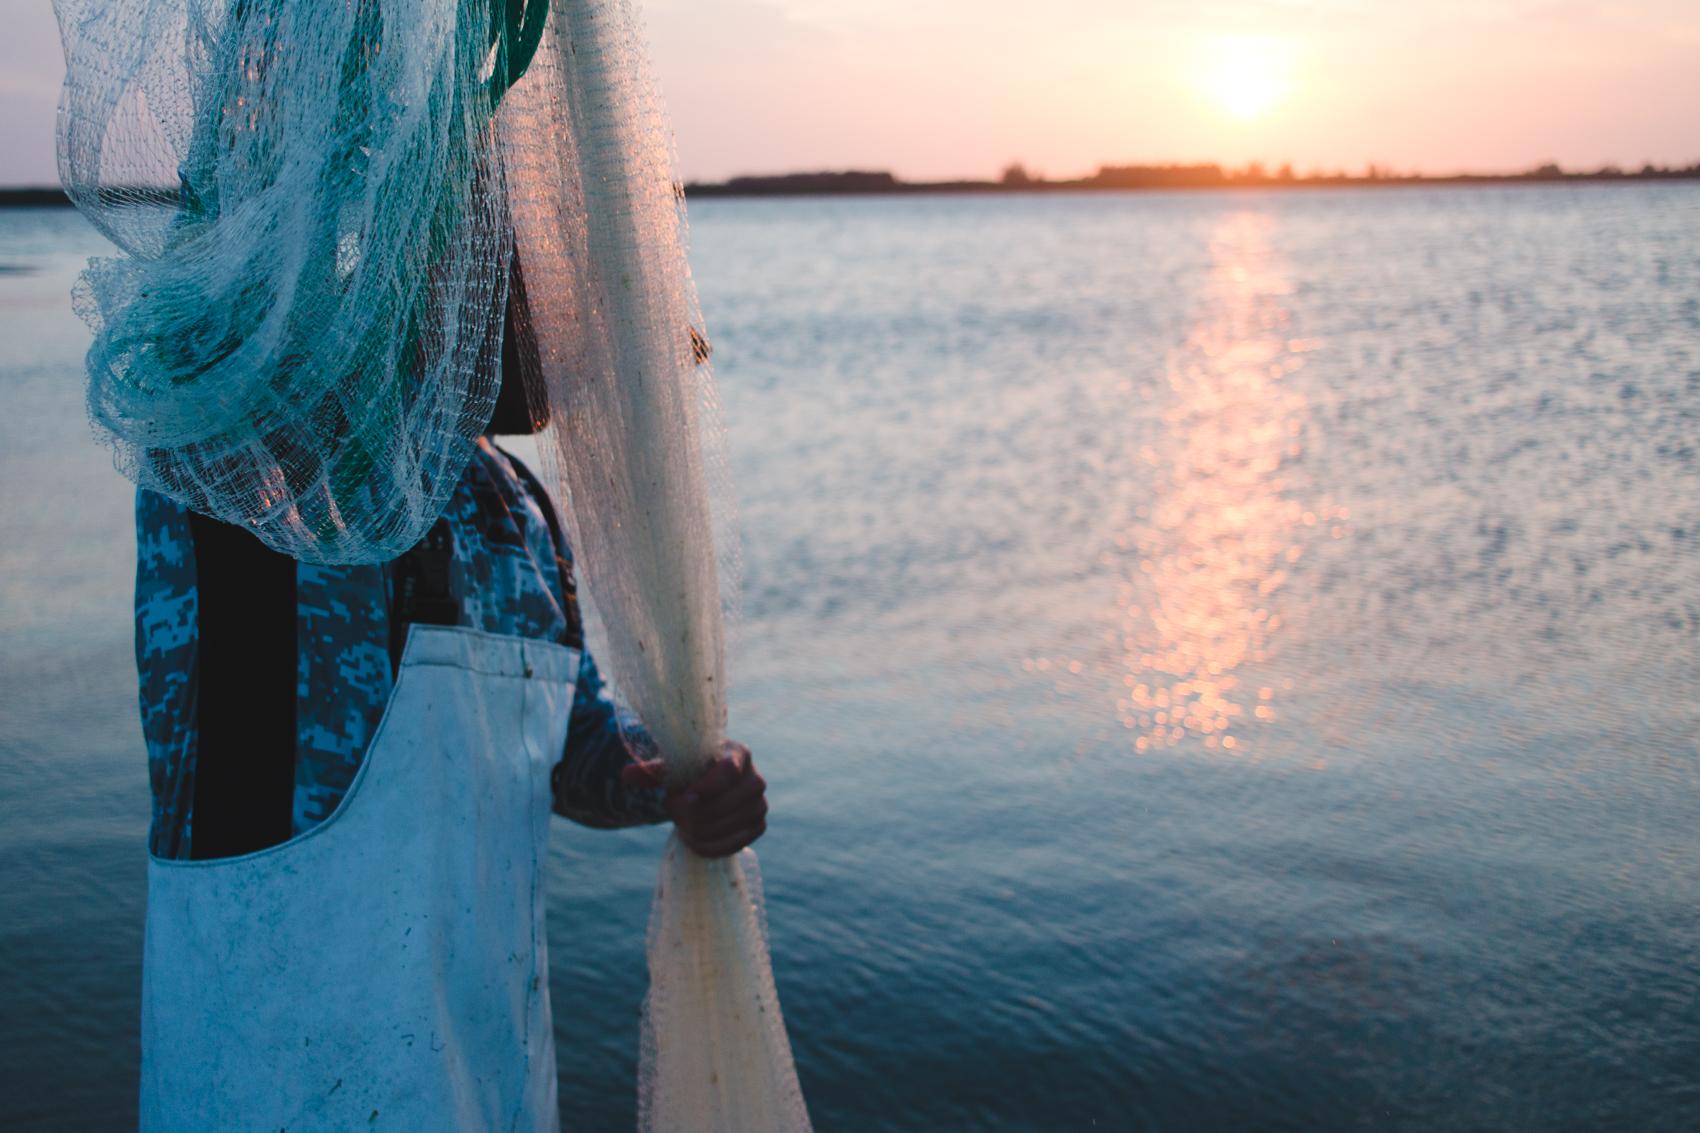 Kurt Stevens Portraits and Lifestyles. Photographed in Vero Beach, FL by Nathaniel Harrington.